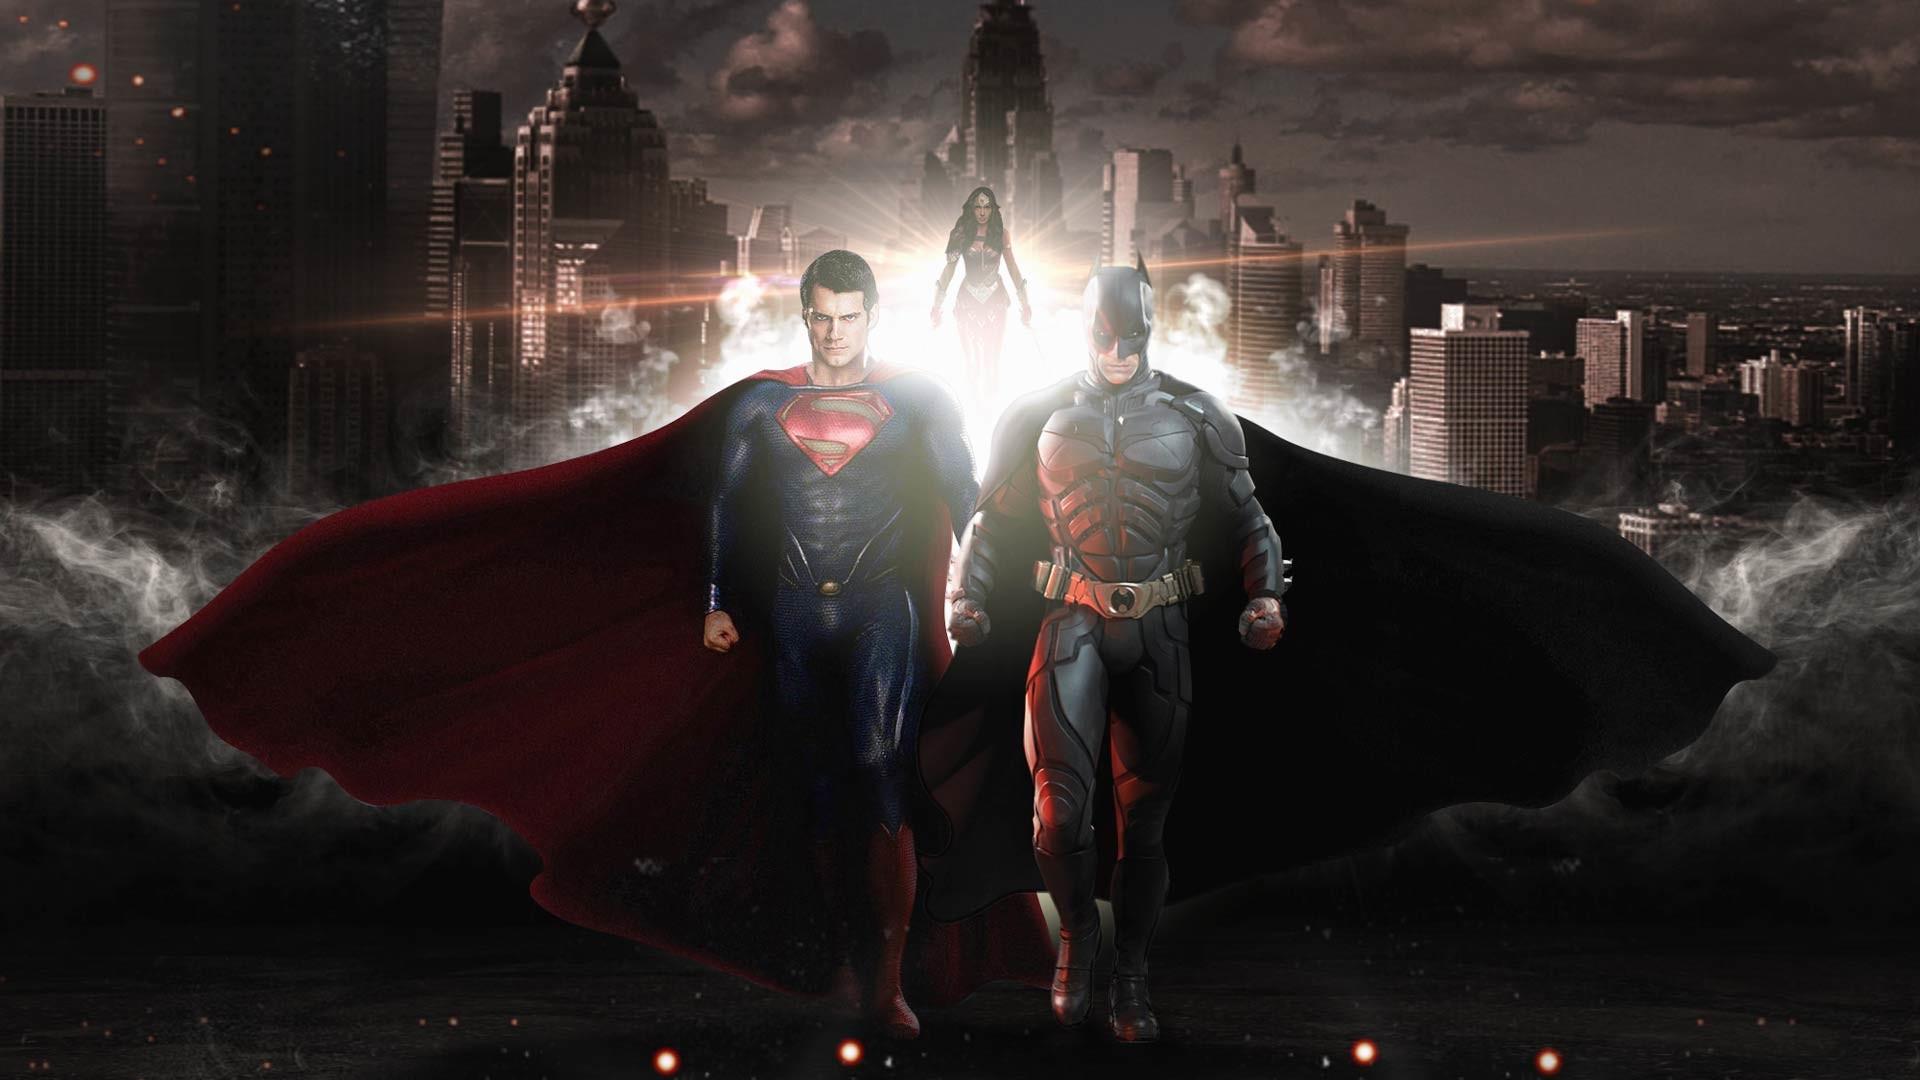 Batman And Superman Wallpaper Background.